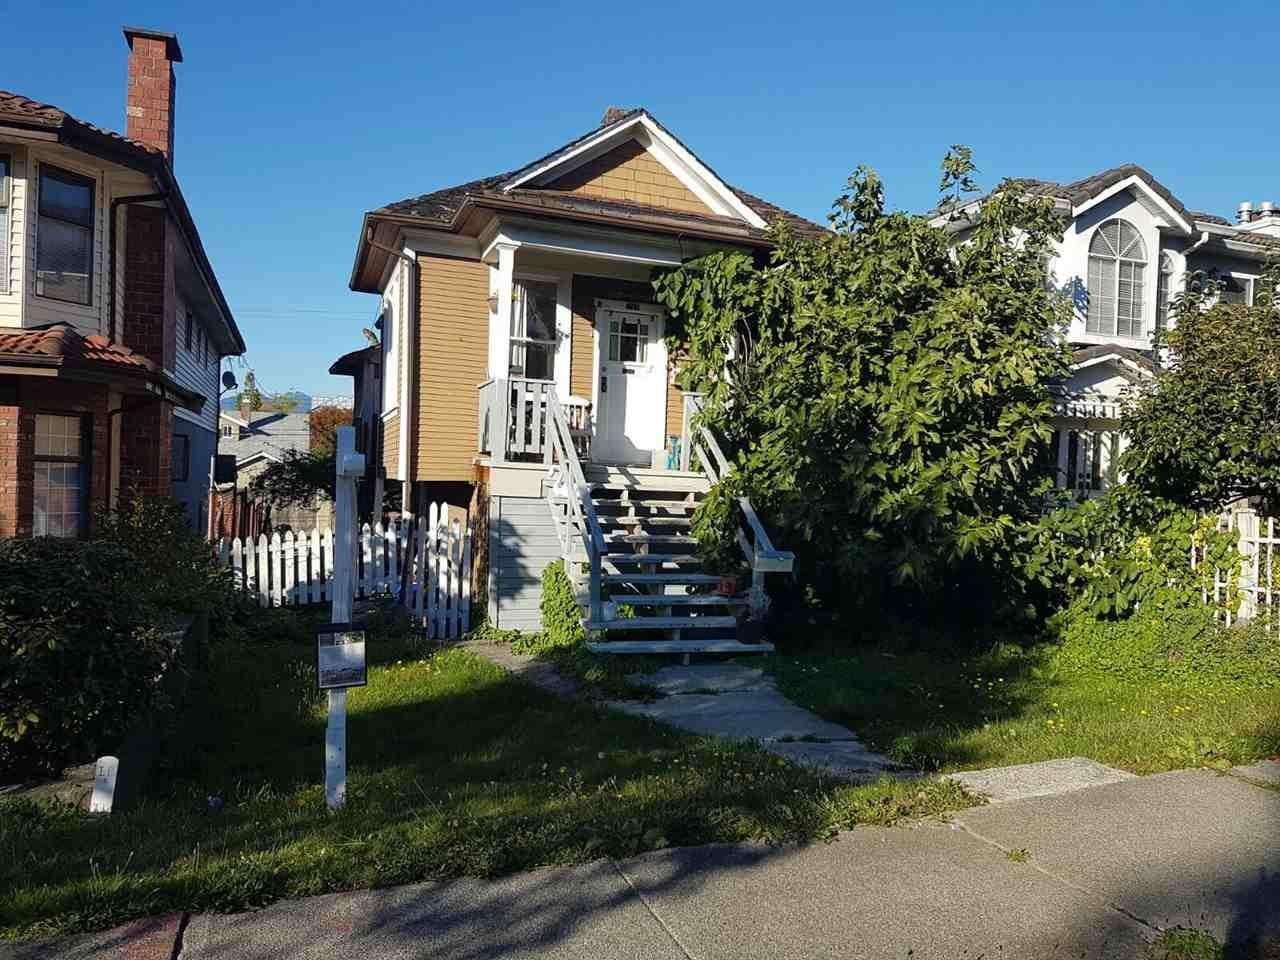 R2112994 - 257 E 38TH AVENUE, Main, Vancouver, BC - House/Single Family